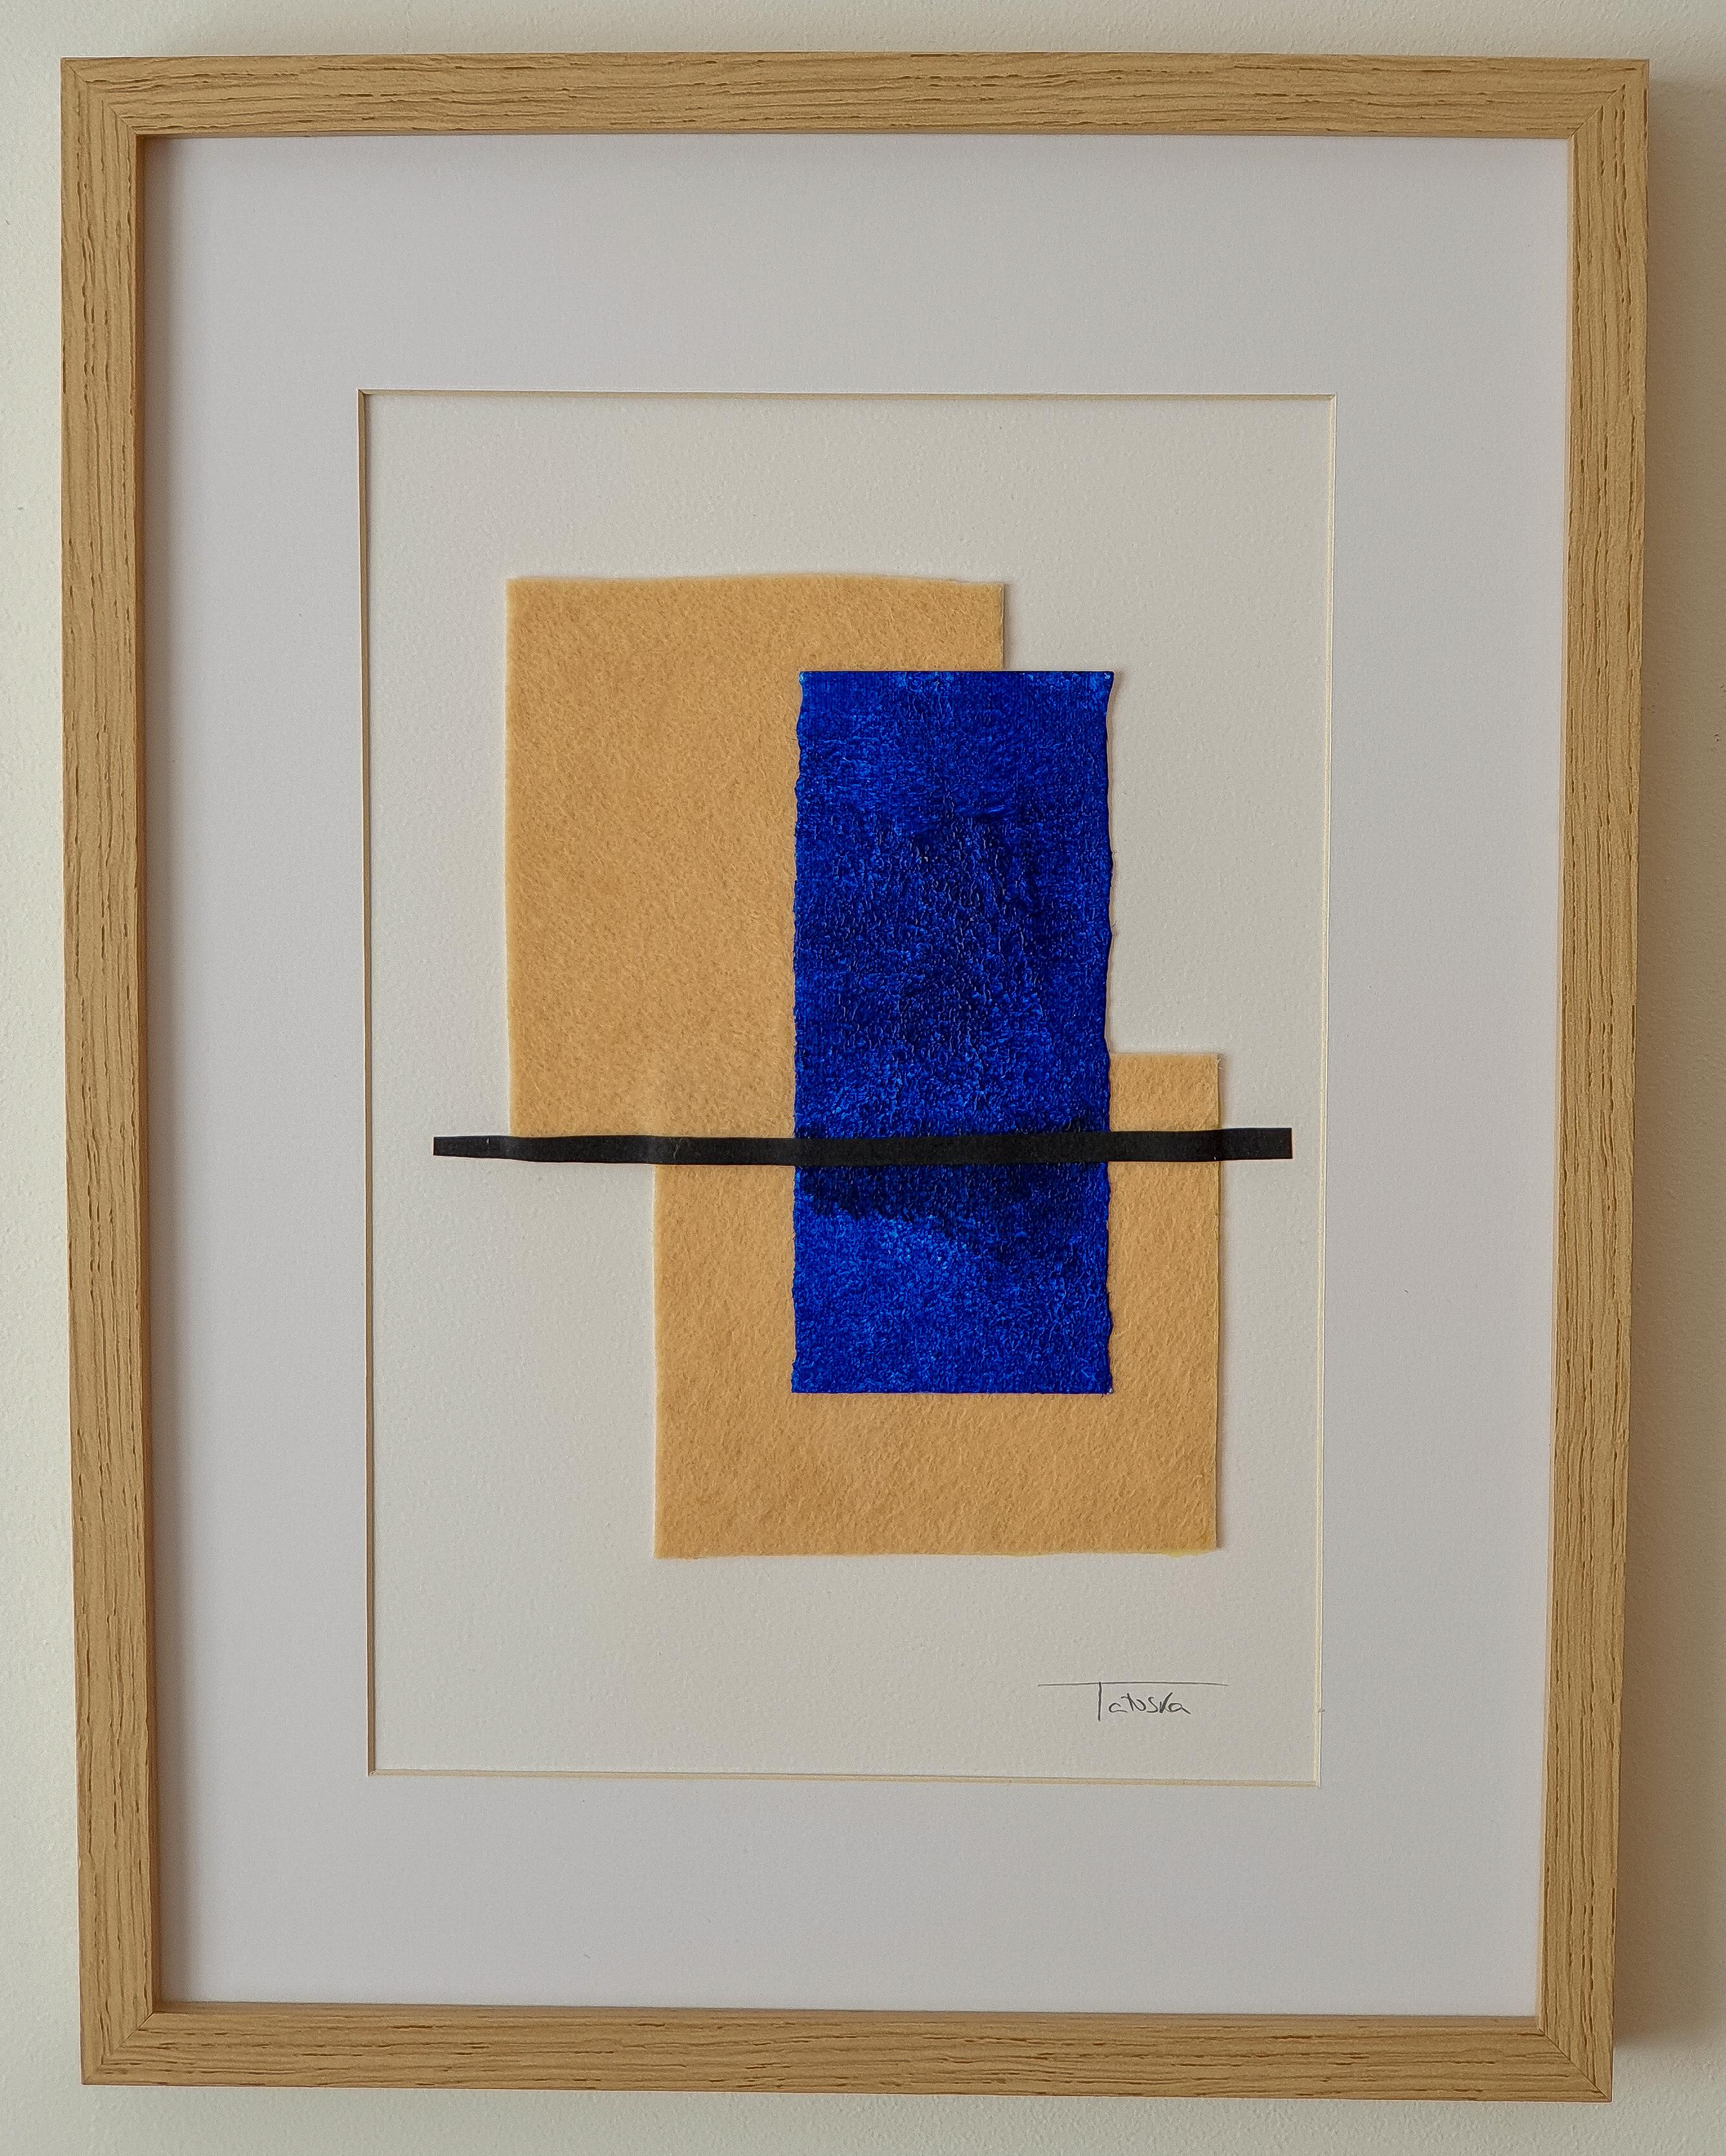 "Cuadro de arte abstracto titulado ""The island"" de la artista de arte abstracto contemporáneo Tatuska"